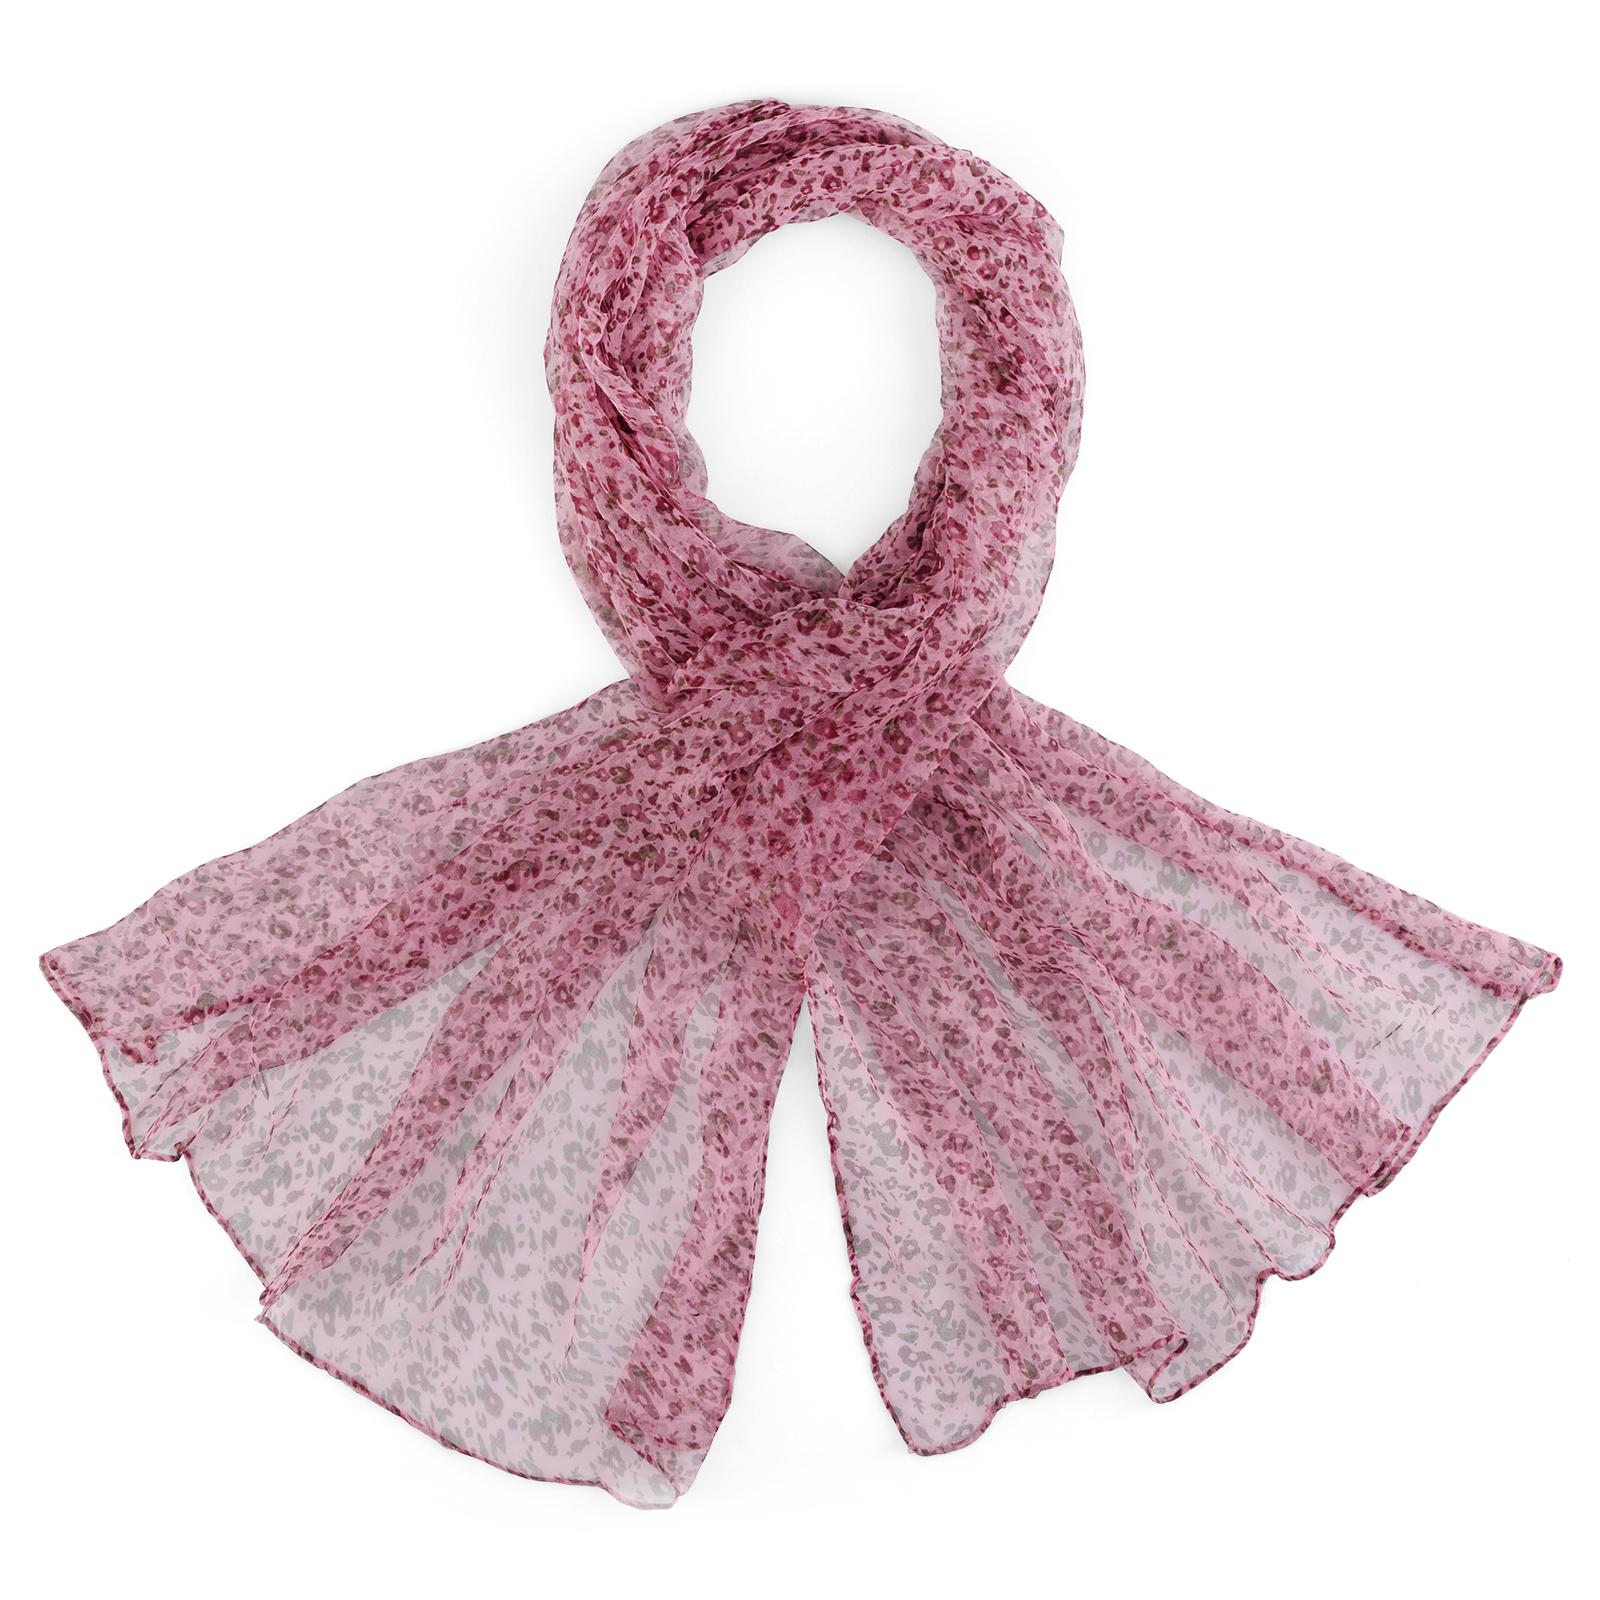 AT-03740-foulard-mousseline-soie-fines-fleurs-rose-violine-F16